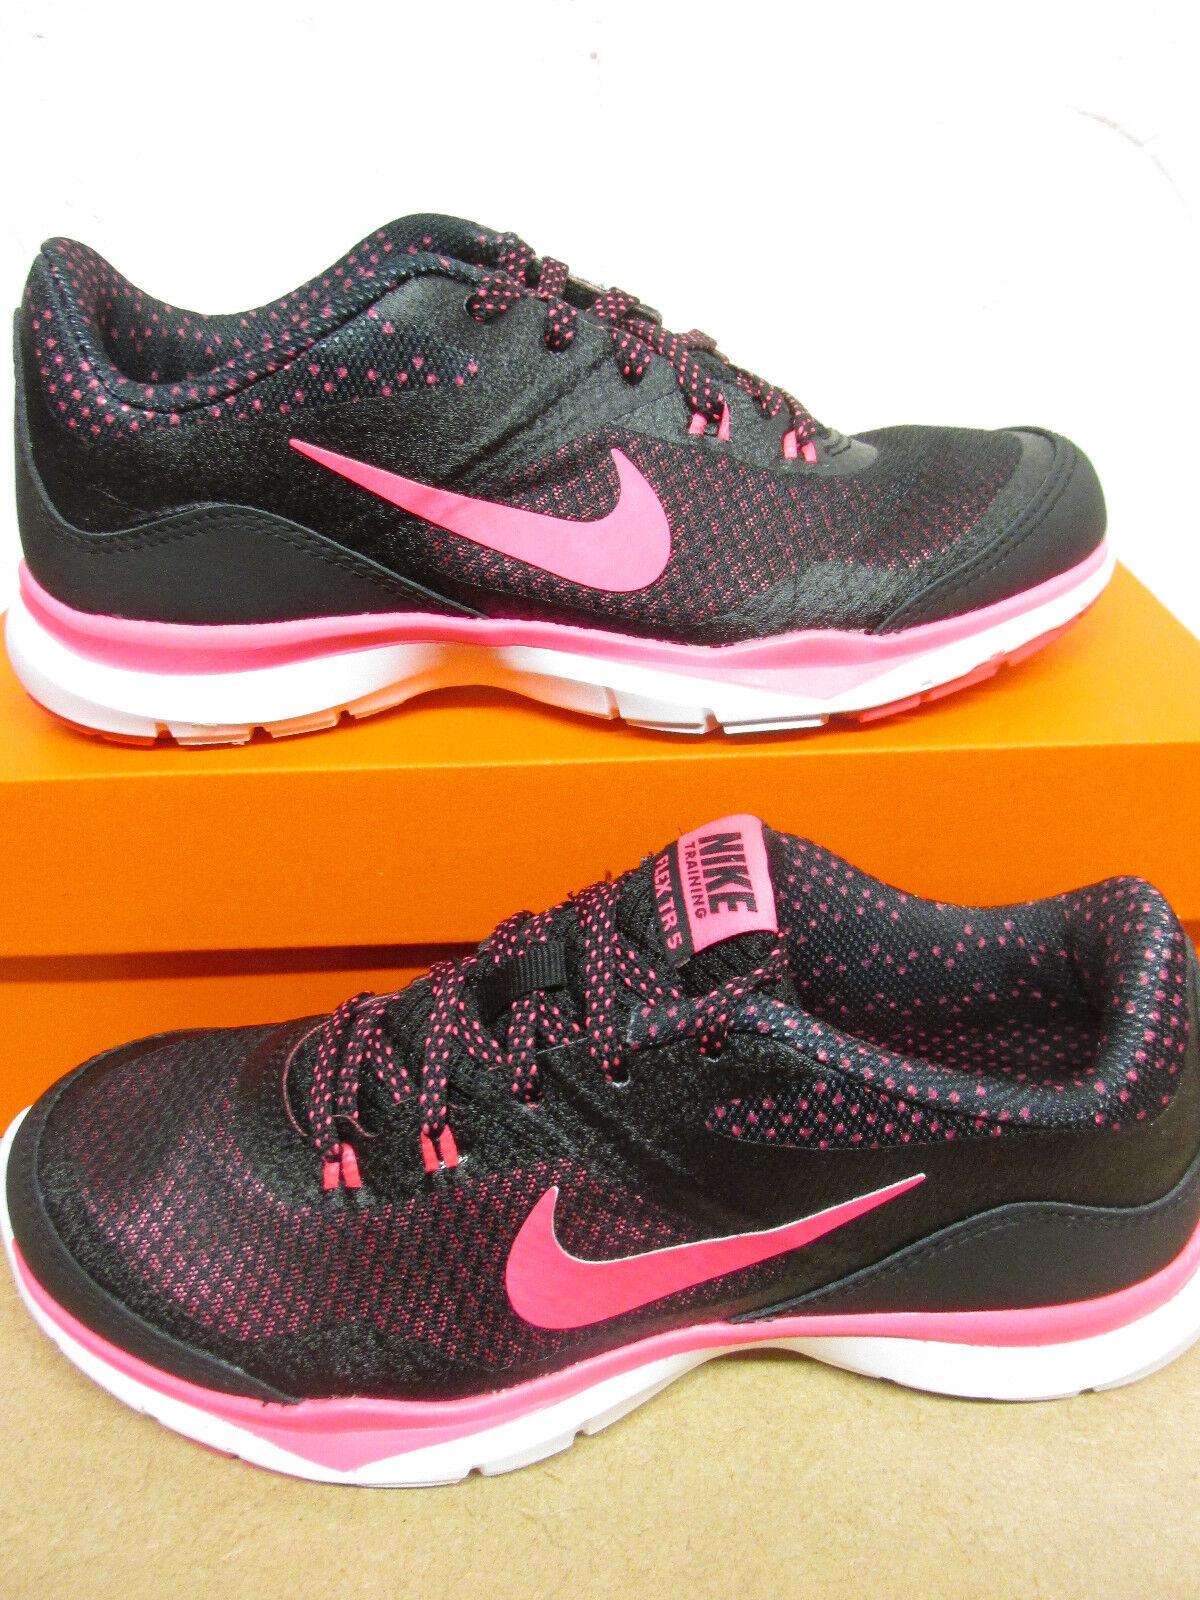 Nike da donna FLEX SPORTIVO 5 stampa Scarpe da corsa 749184 018 Scarpe da tennis